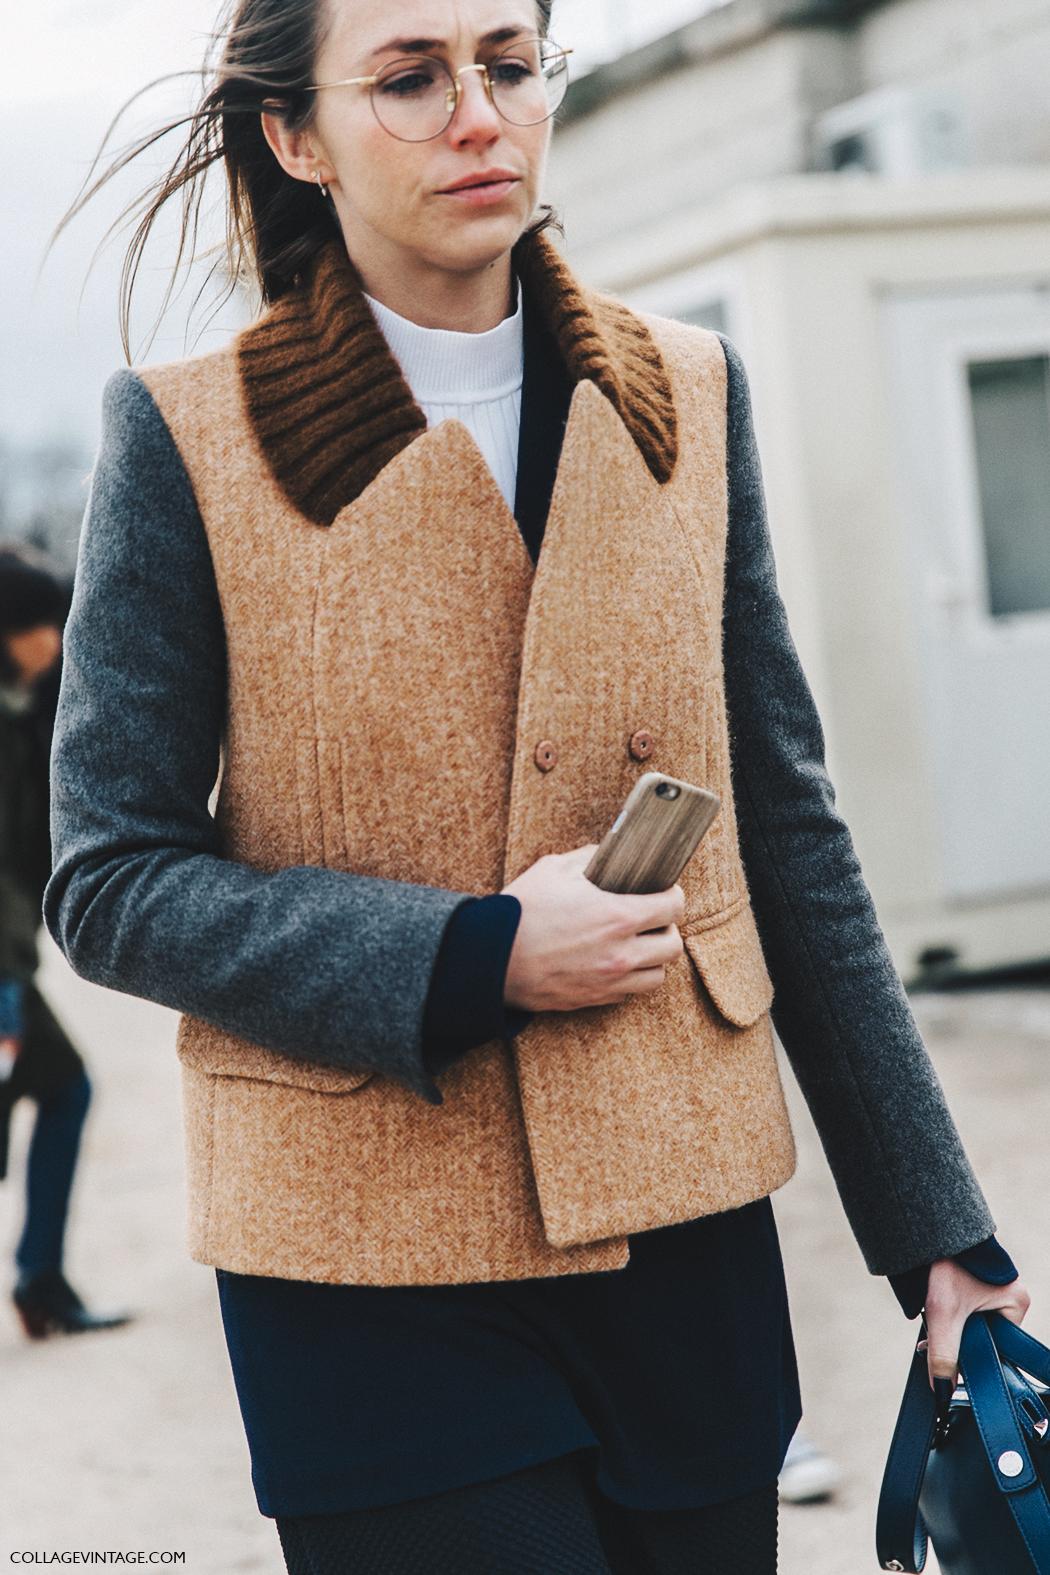 PFW-Paris_Fashion_Week_Fall_2016-Street_Style-Collage_Vintage-Jacket-